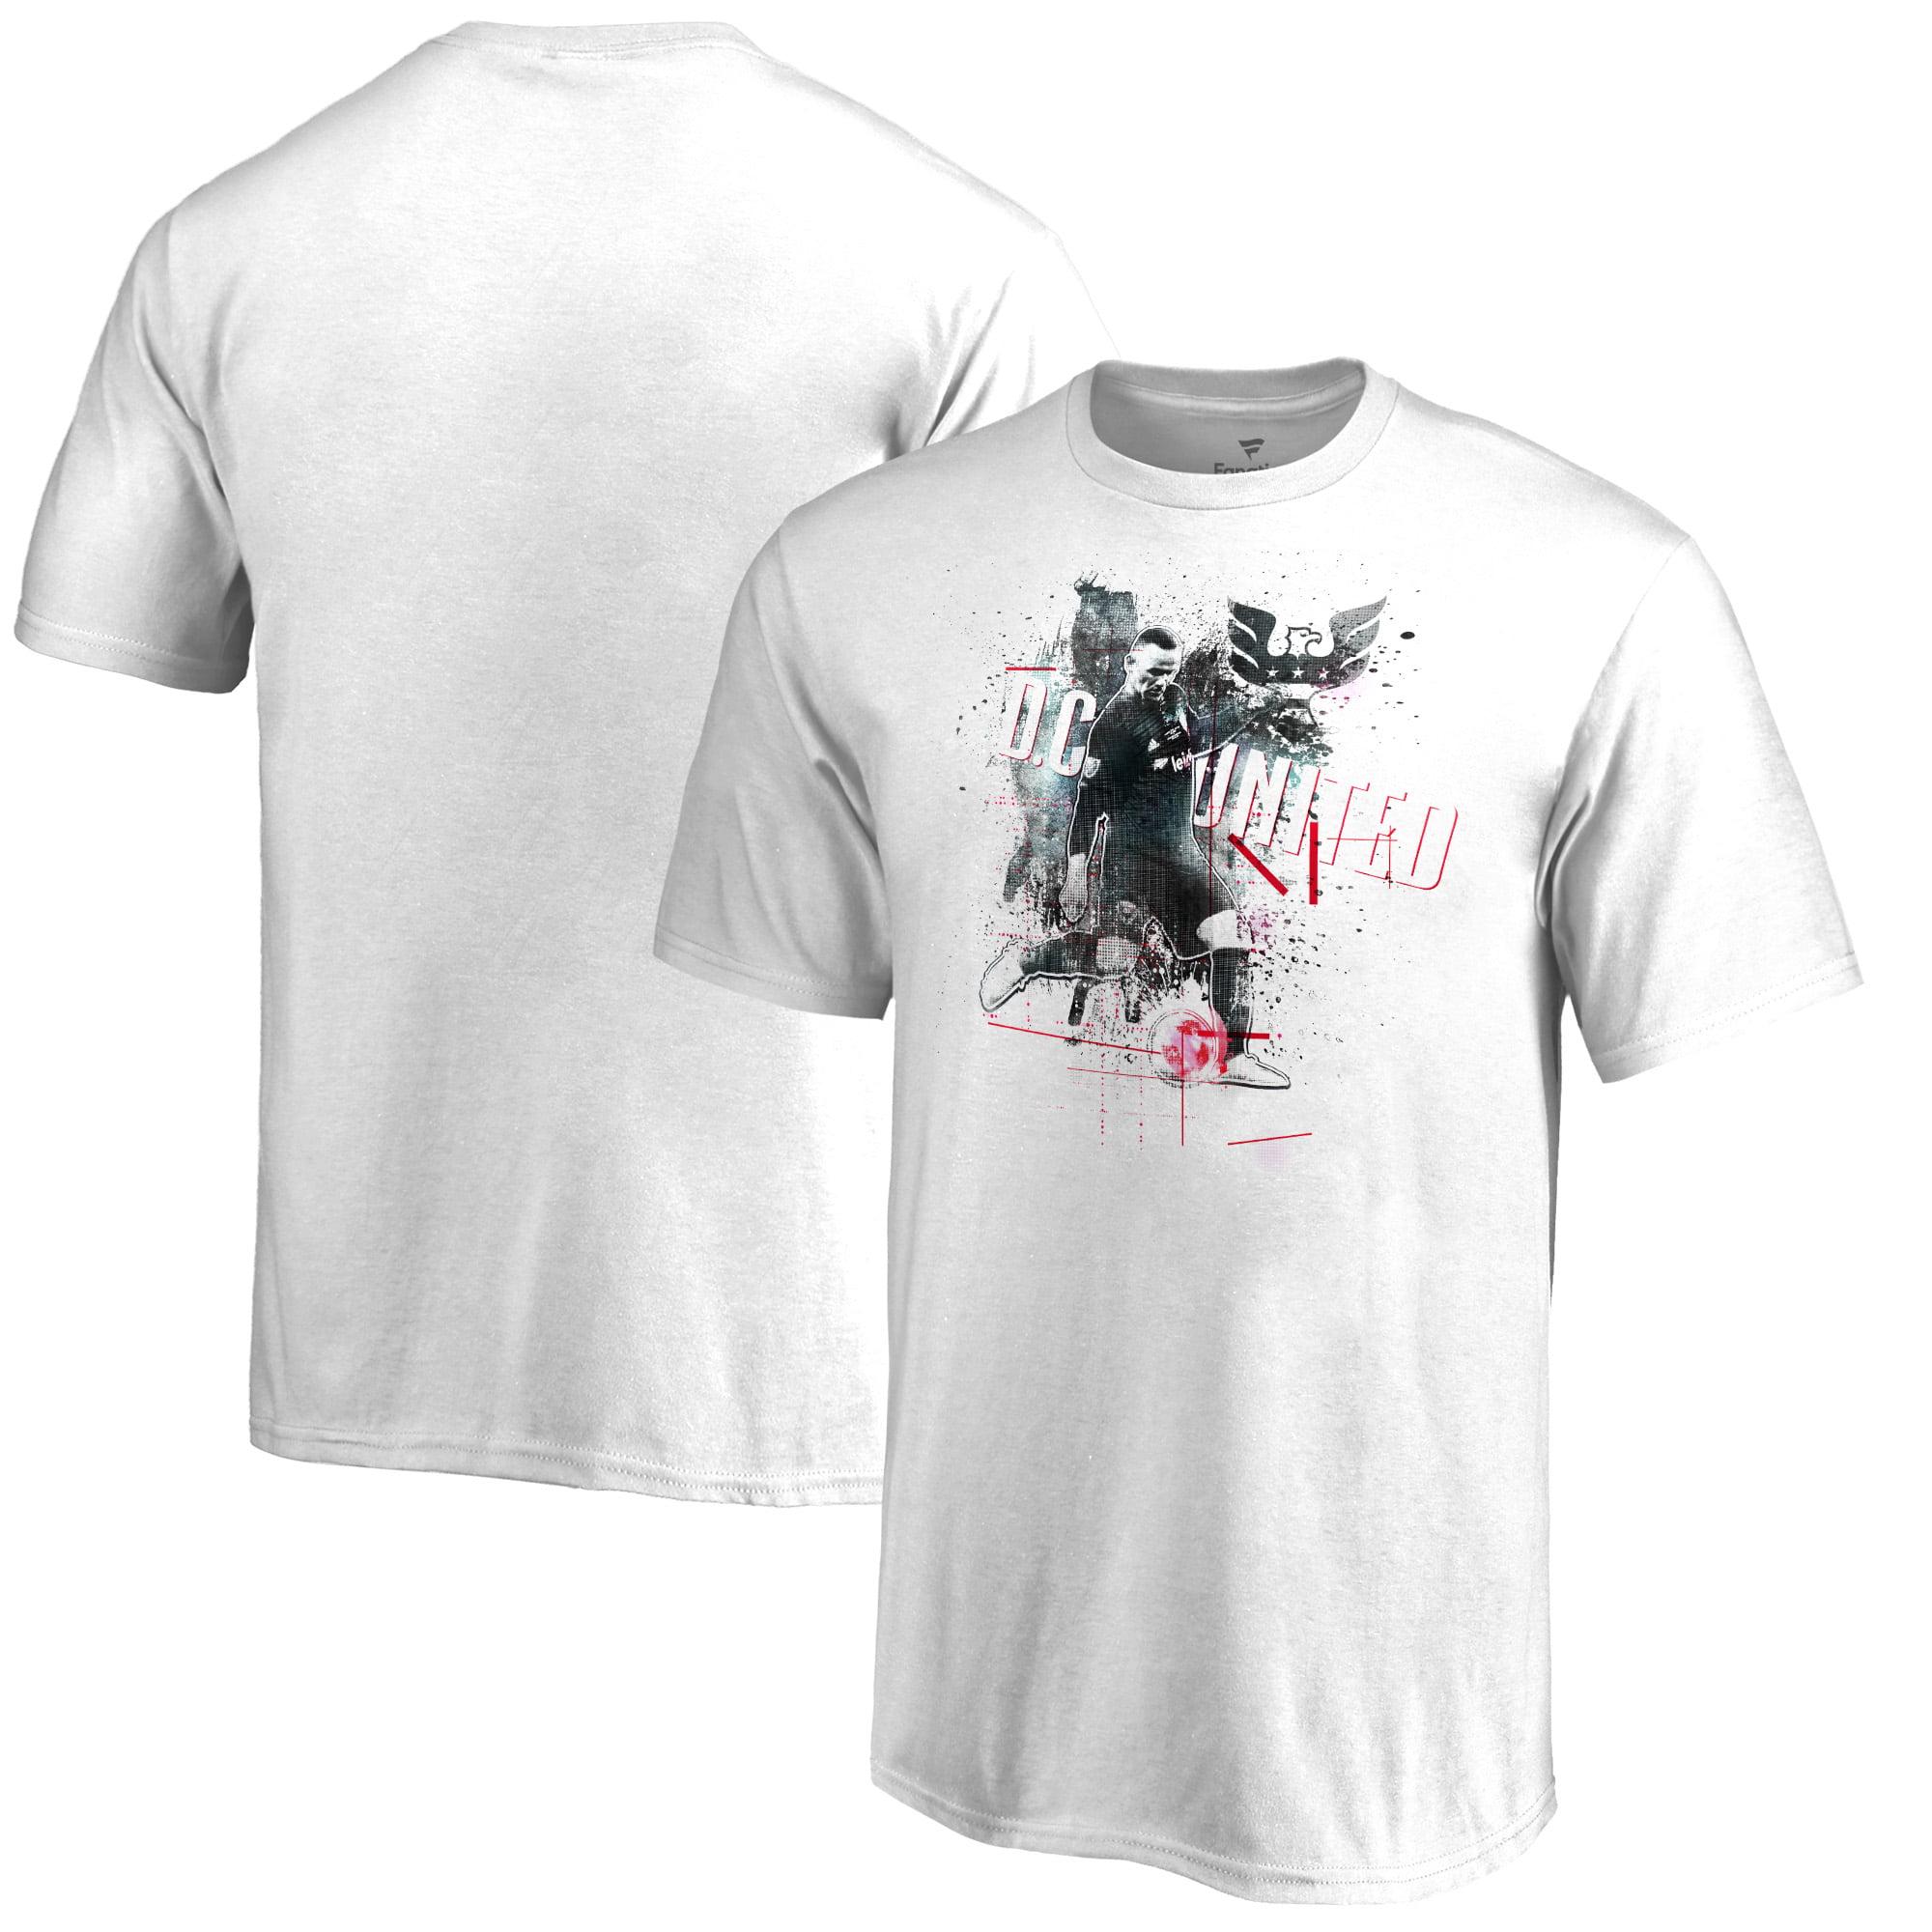 Wayne Rooney D.C. United Fanatics Branded Image T-Shirt - White